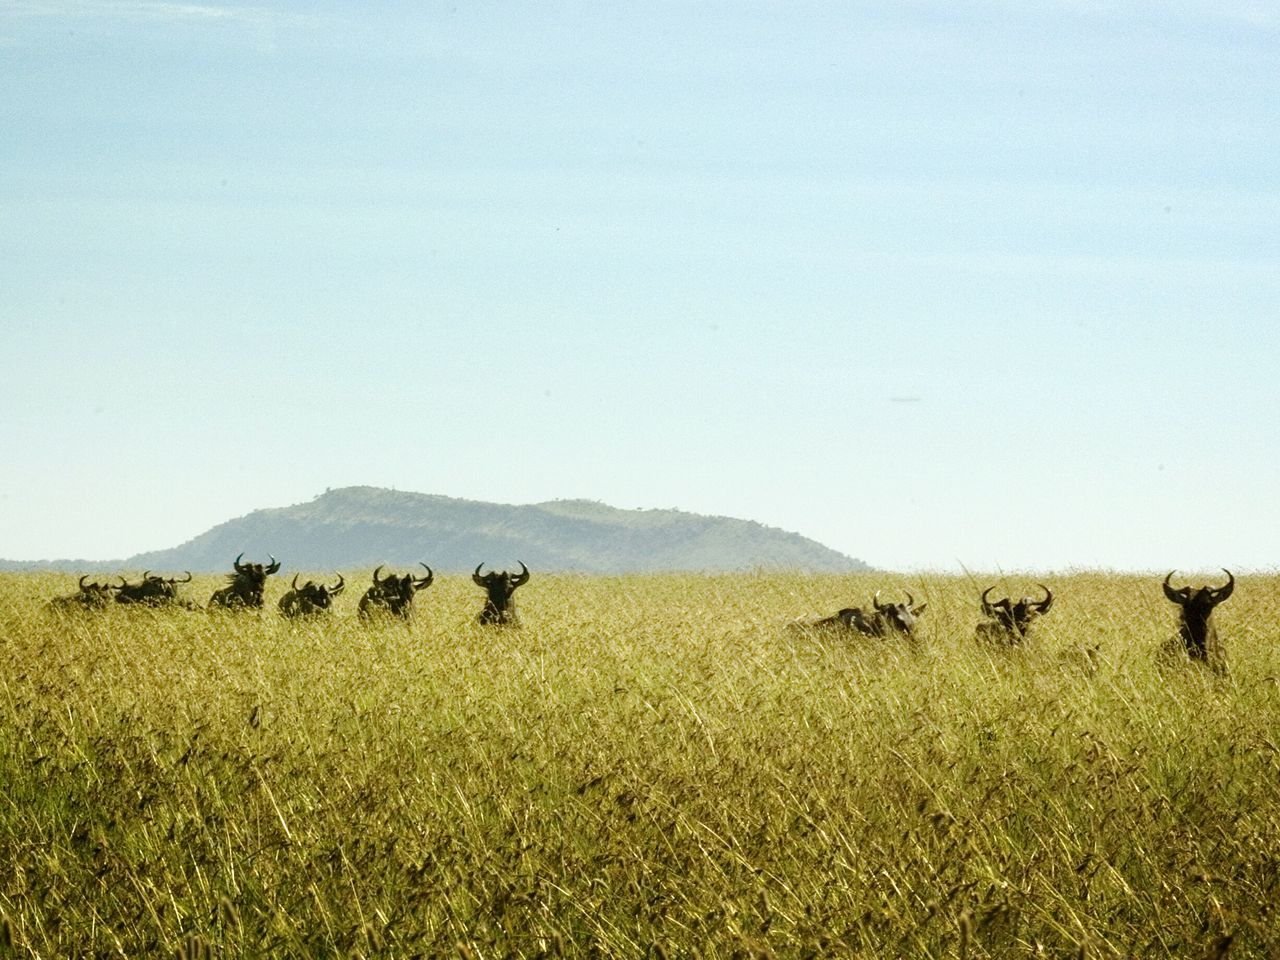 Landscape Animal Themes Field Nature No People Growth Mammal Serengeti National Park Tanzania Animals In The Wild Safari Animals Wildebeest Mountain